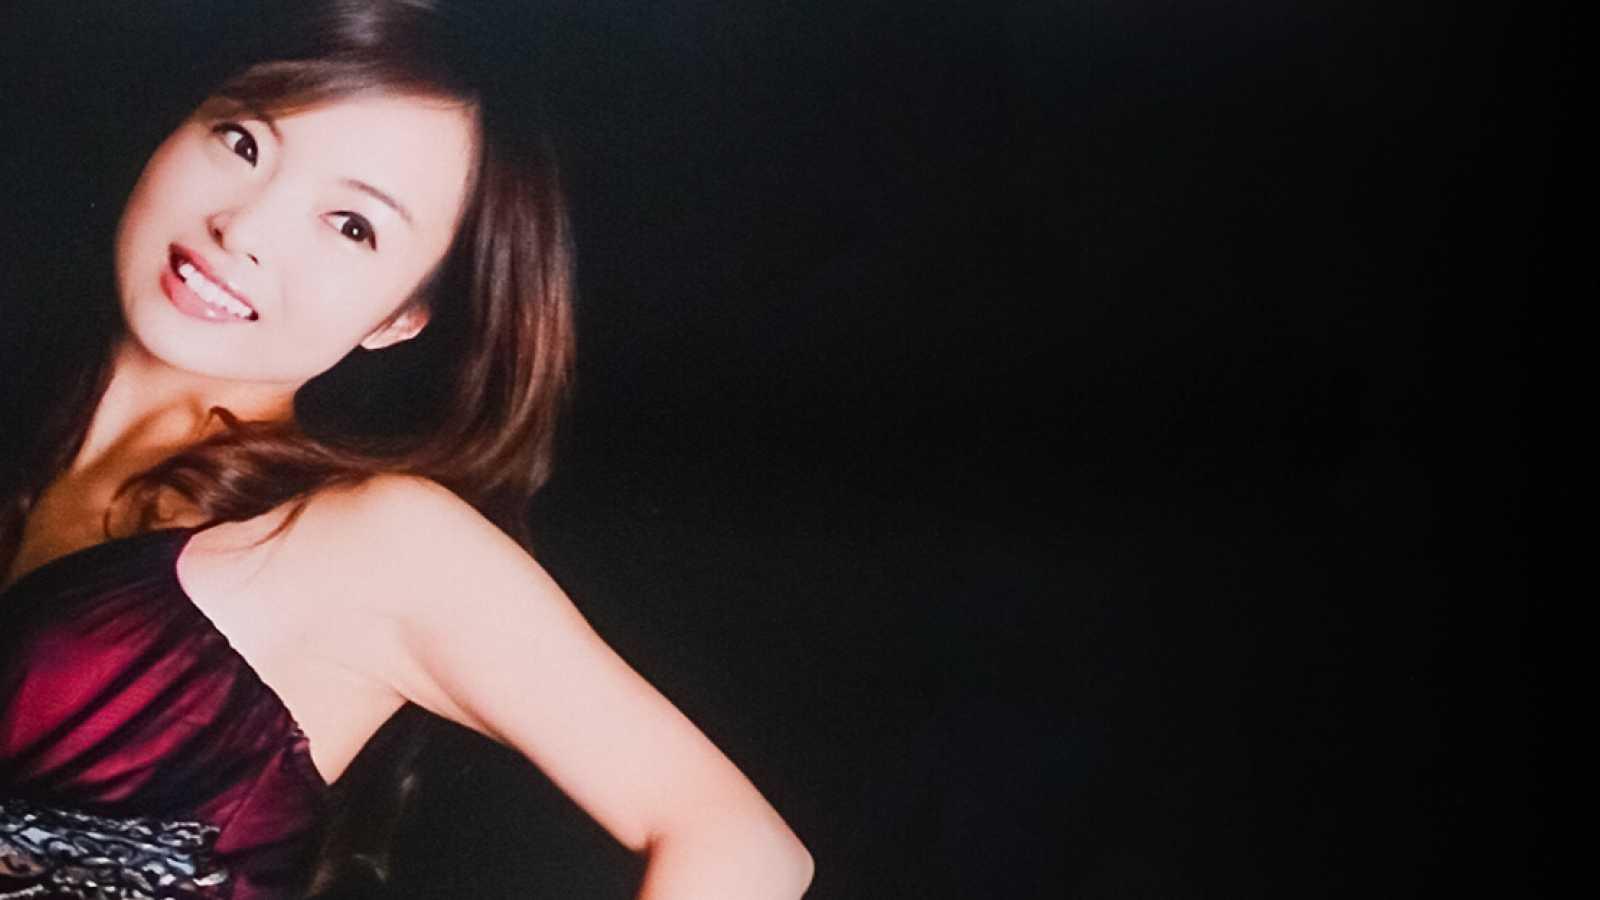 Novo single de Chisato © Chisato all rights reserved.